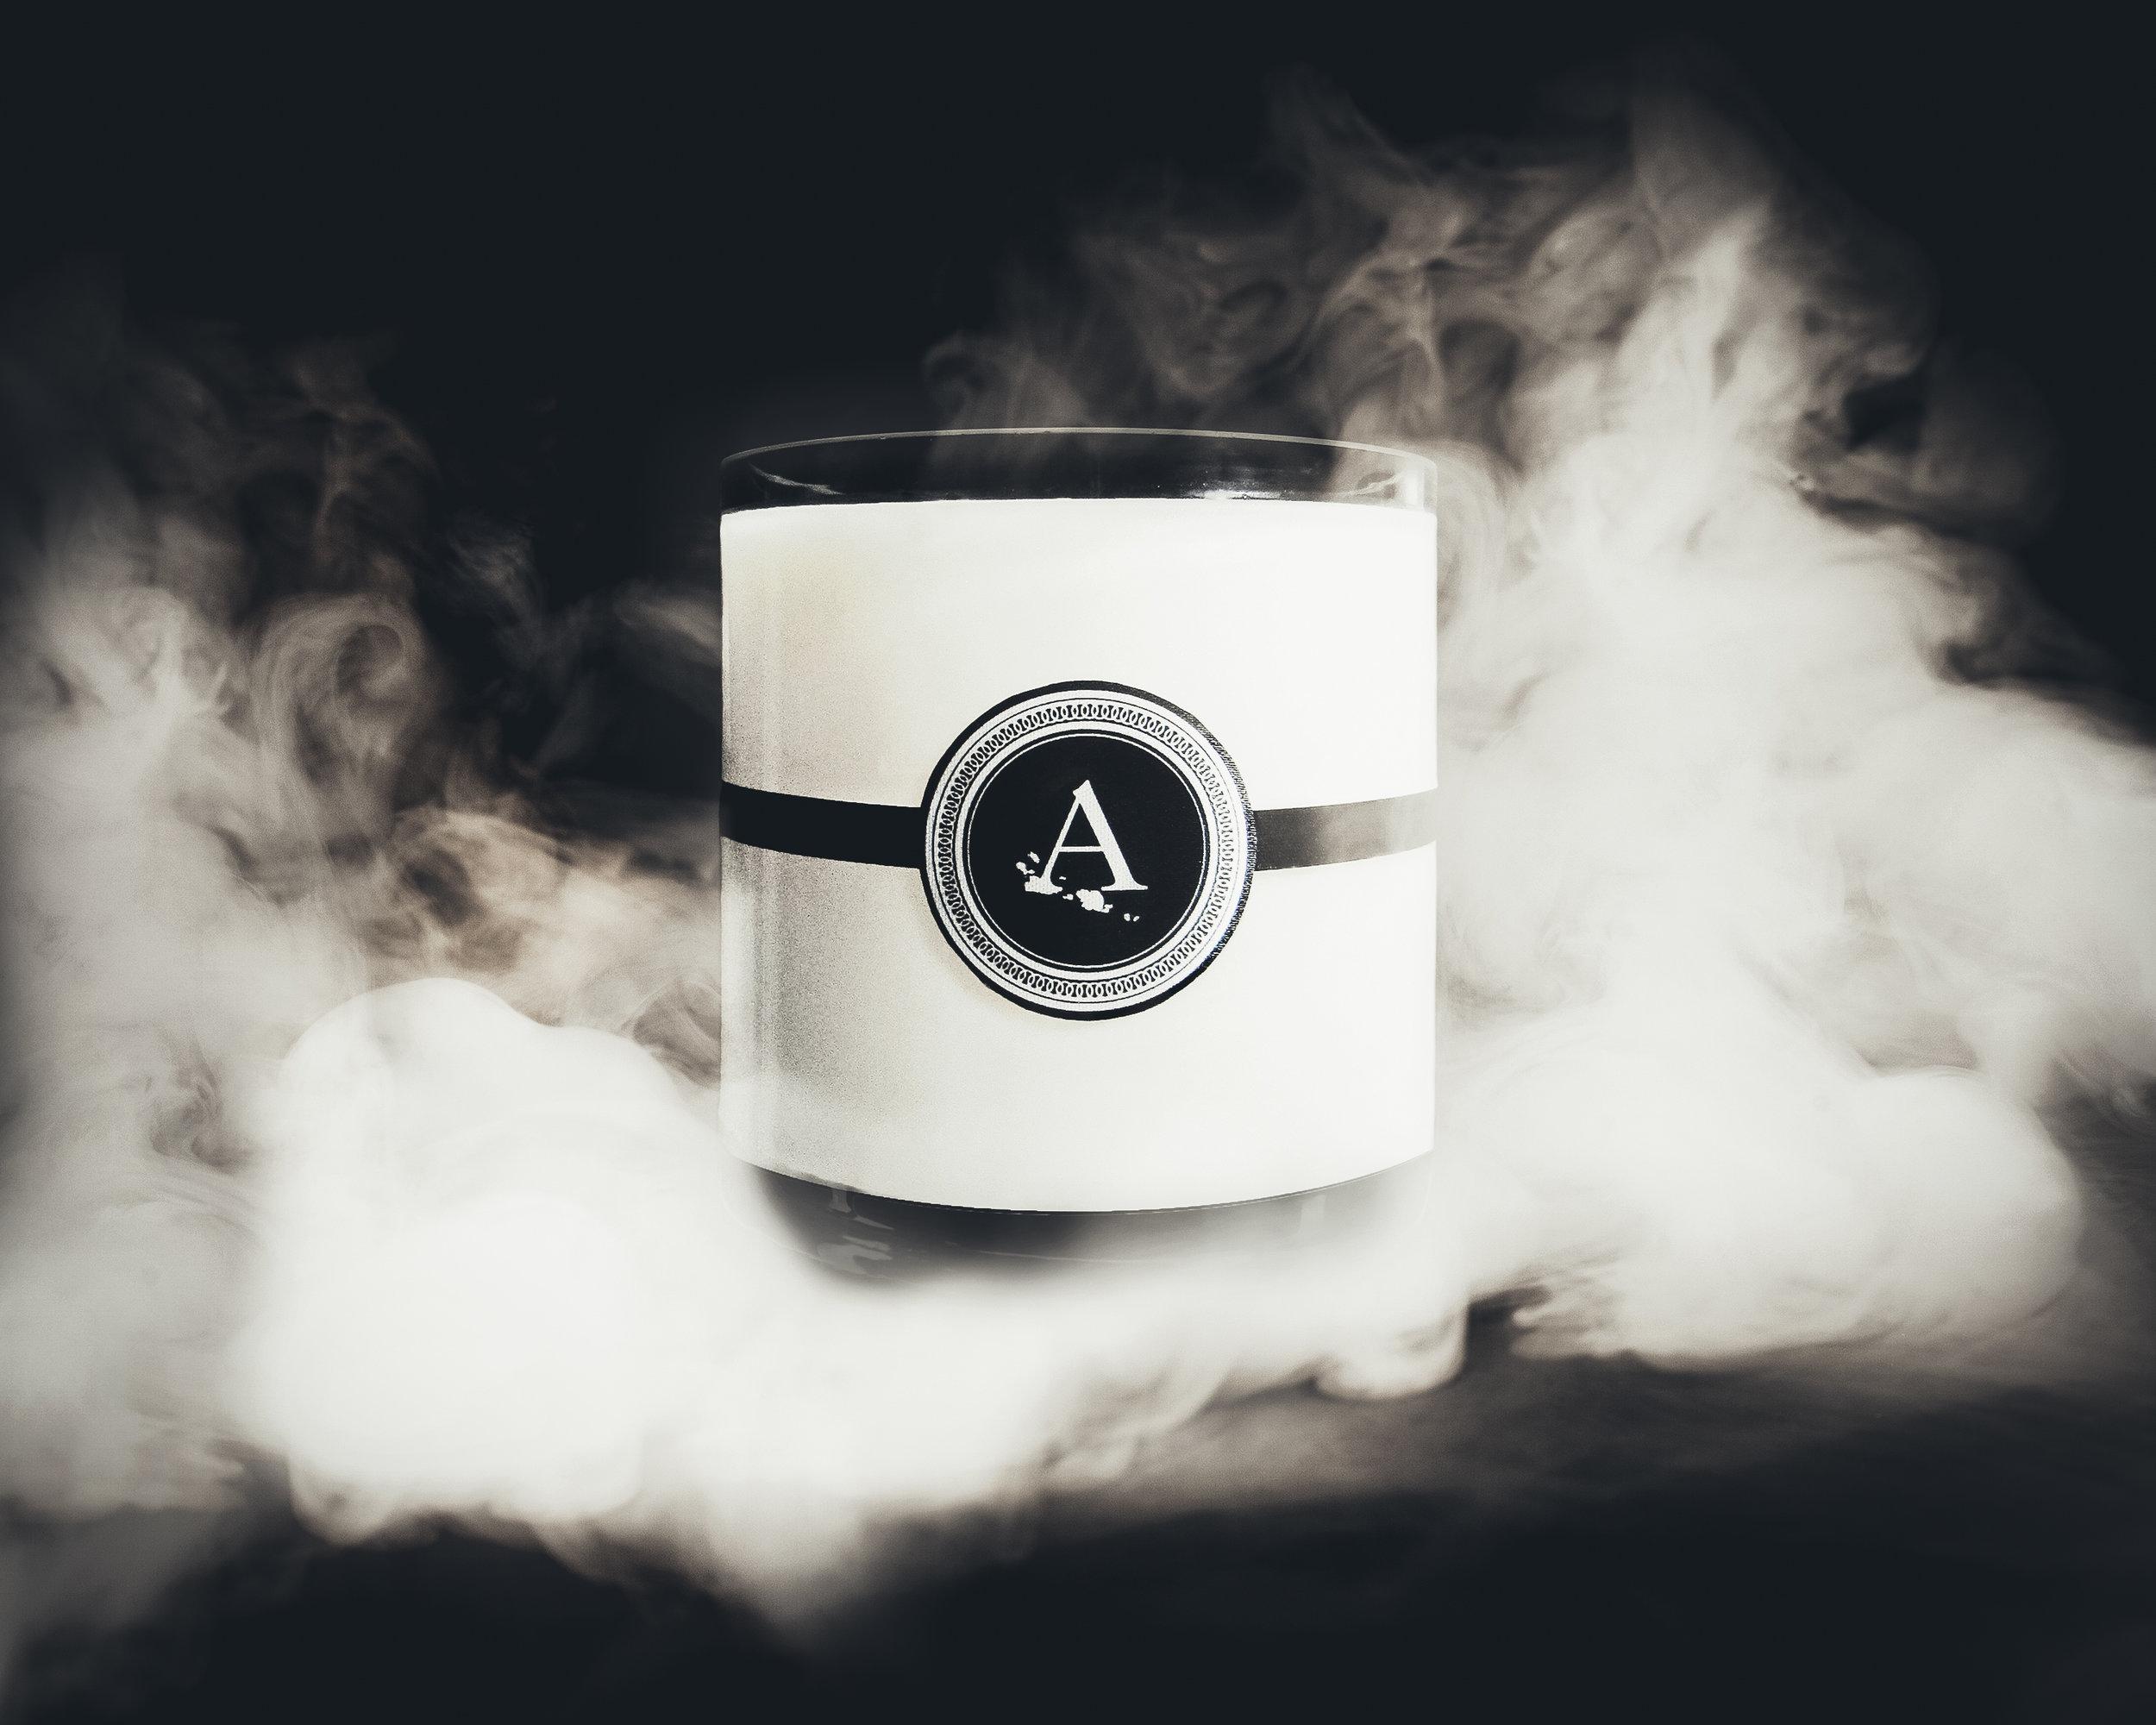 AvantCandle_Website_MainImages_02-Smoke-2.jpg